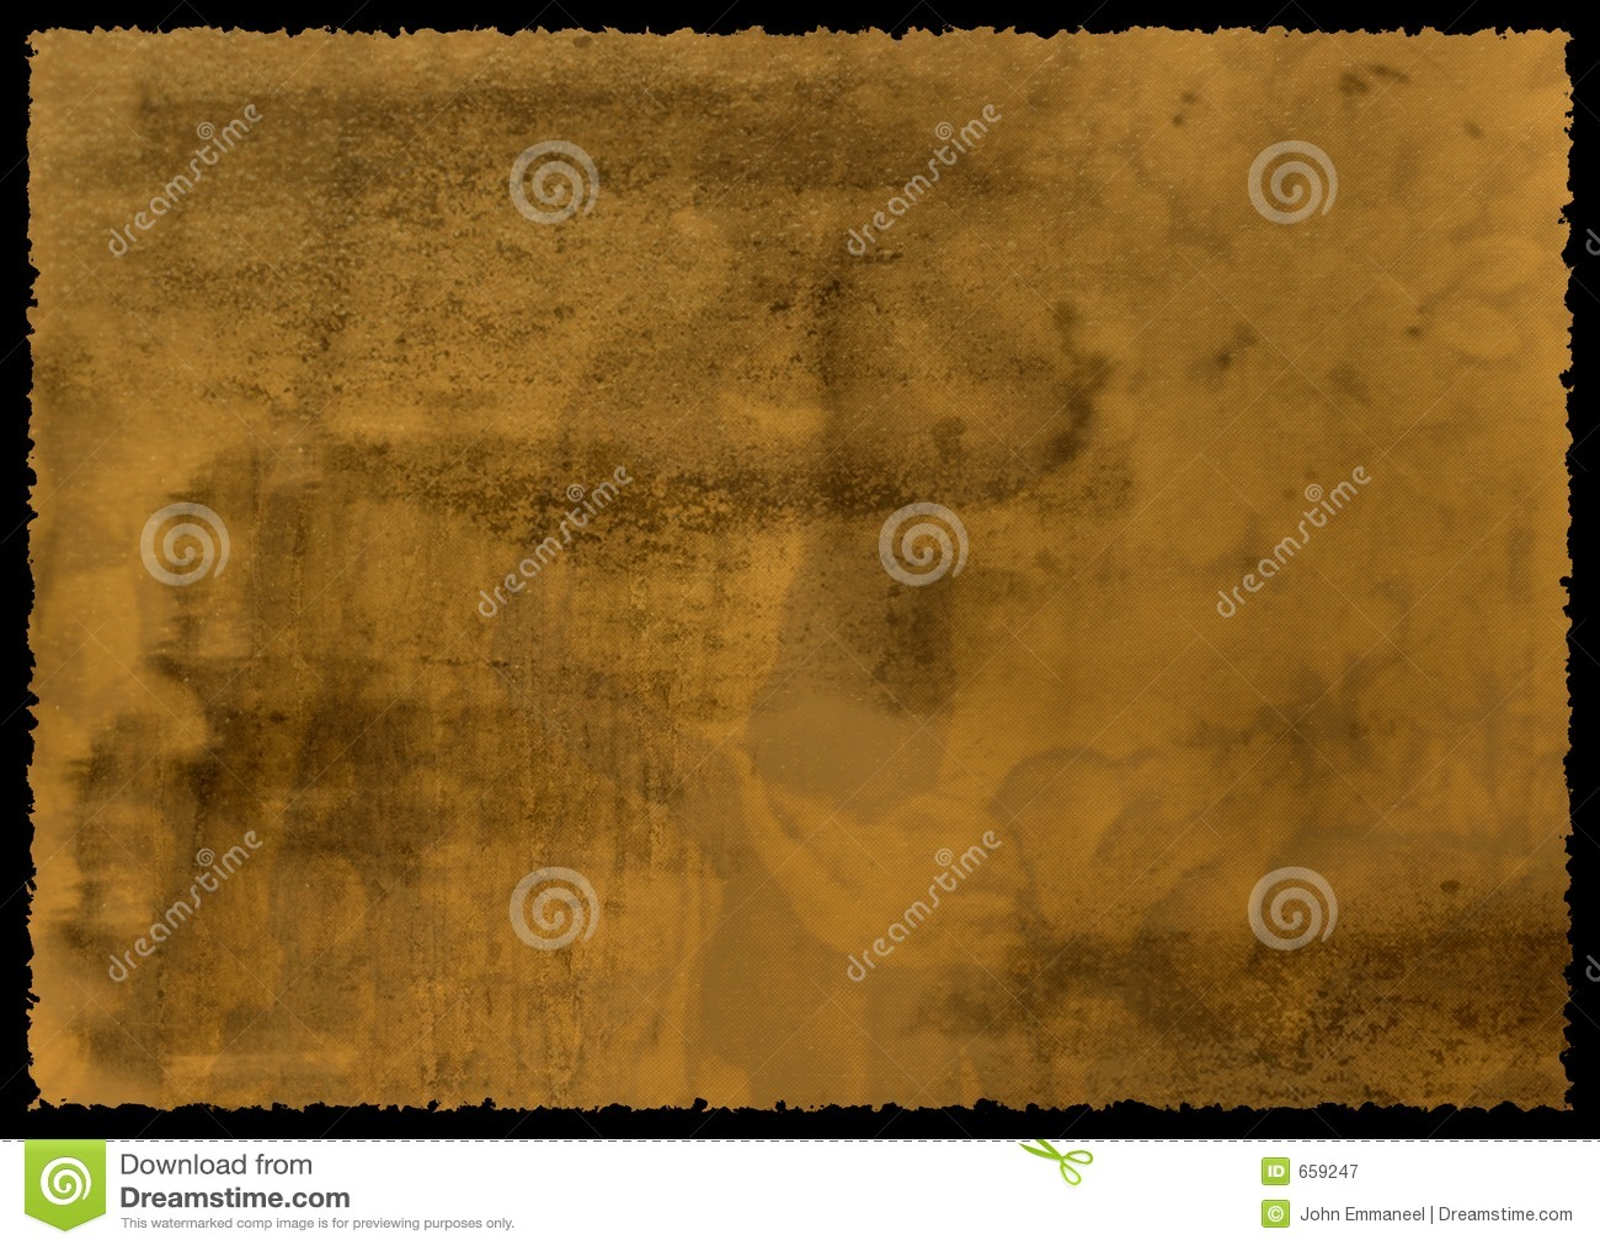 Oud geweven document